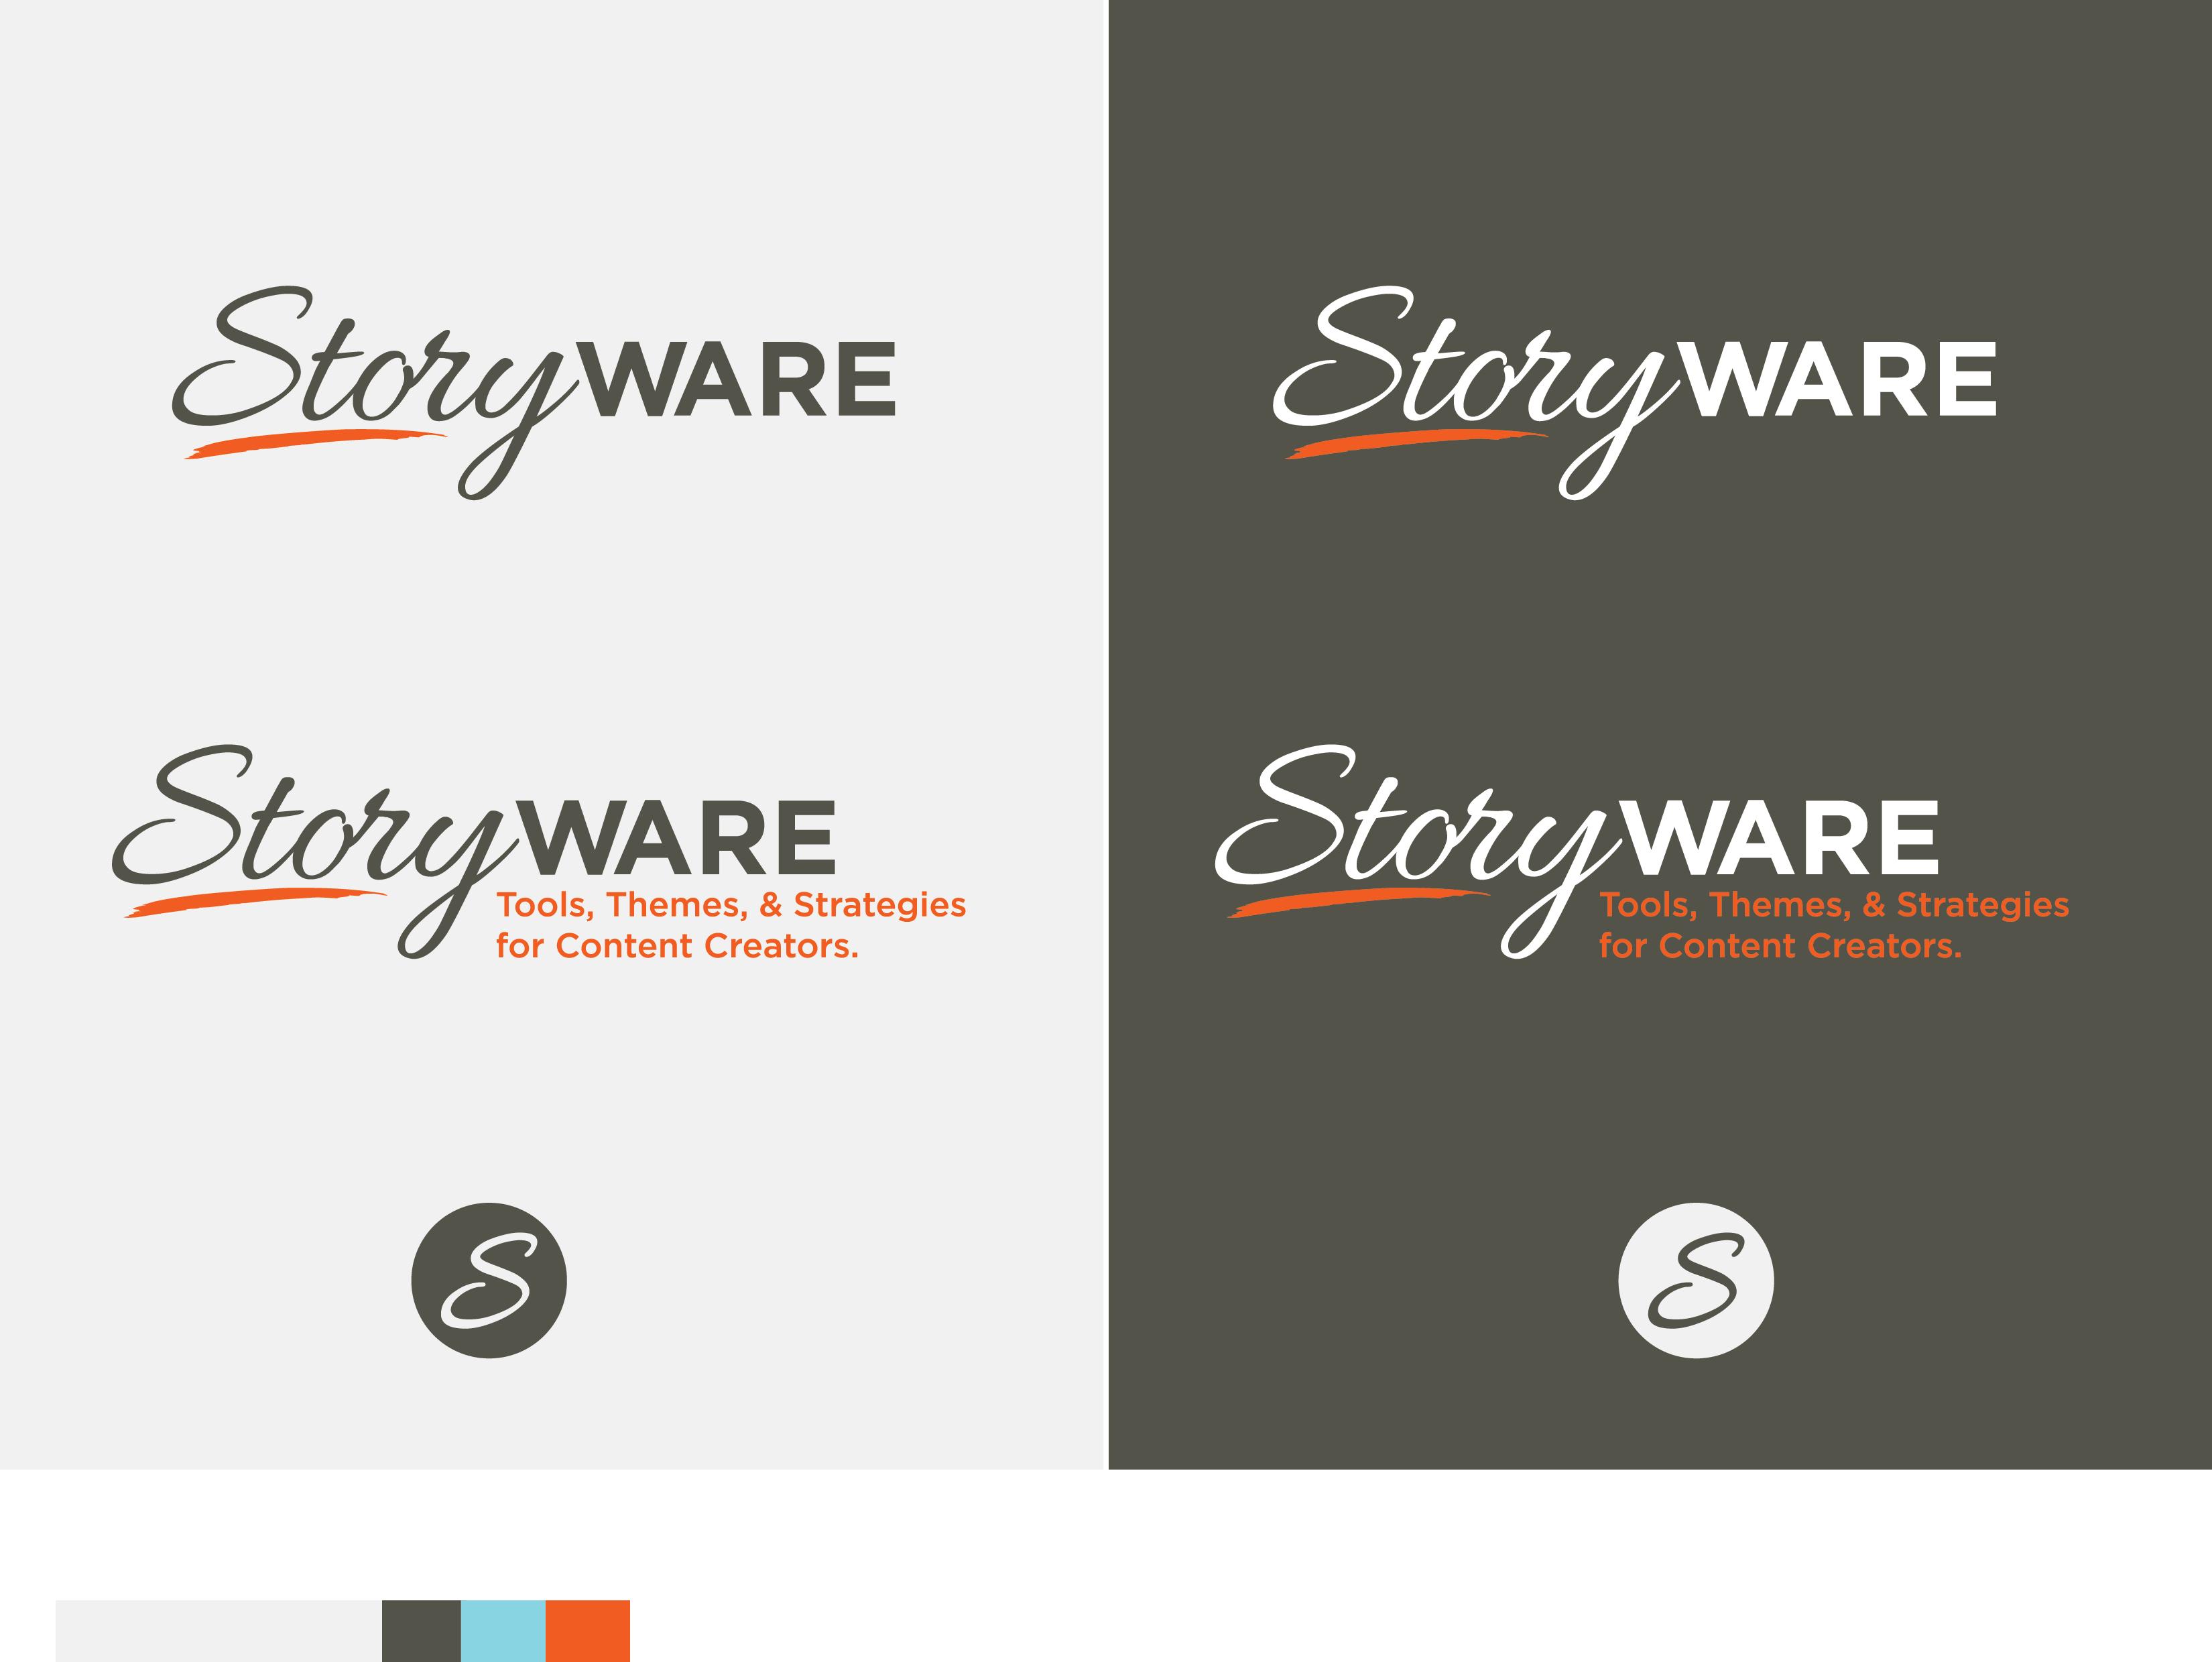 Storyware logos 1.0